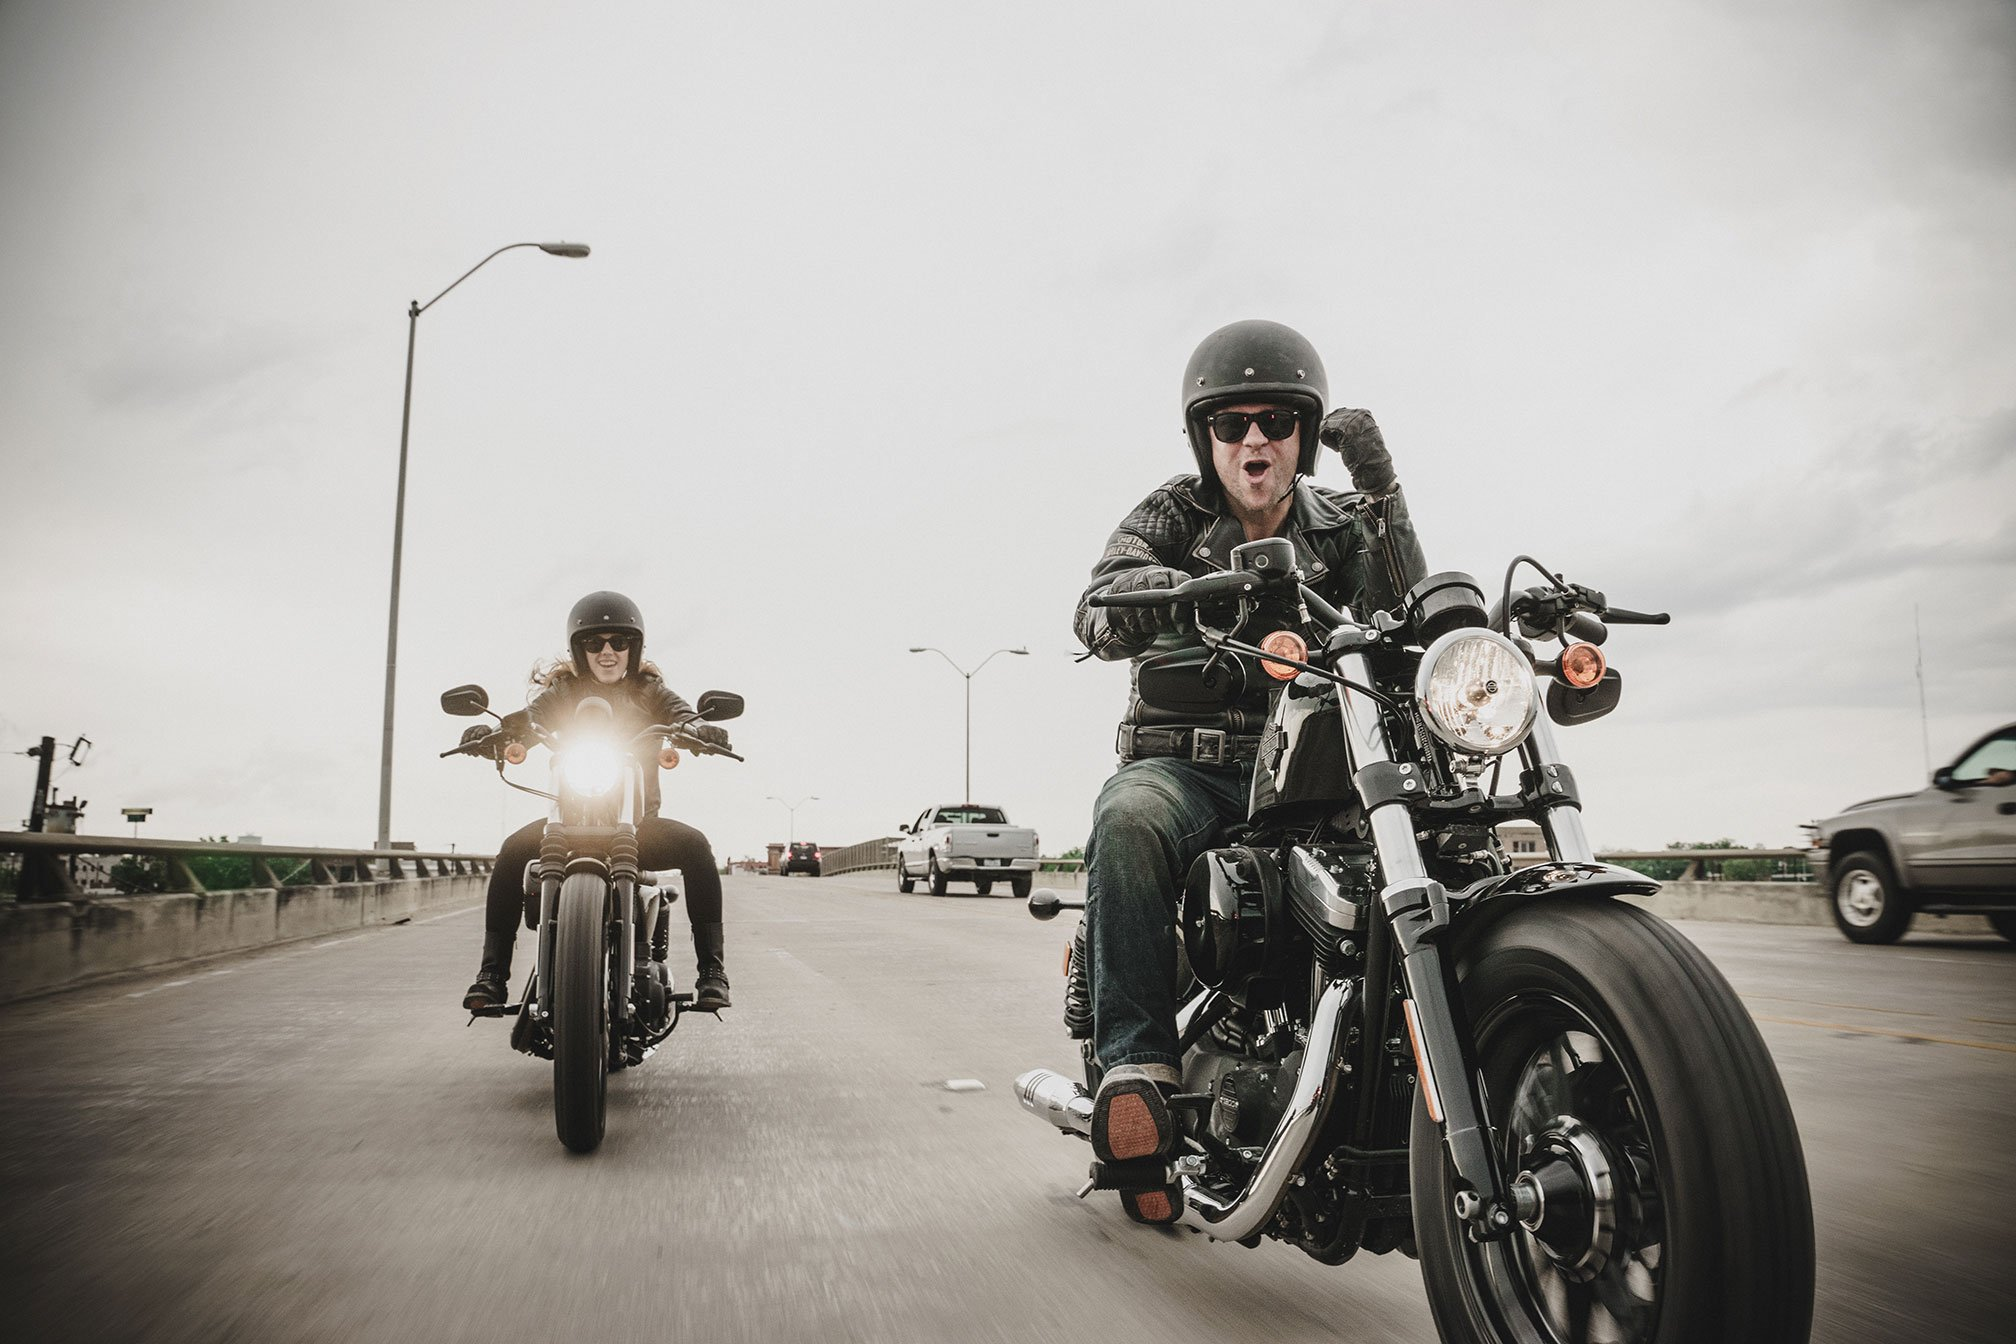 2016 Harley Davidson Forty Eight Motorbike Bike Motorcycle Wallpaper